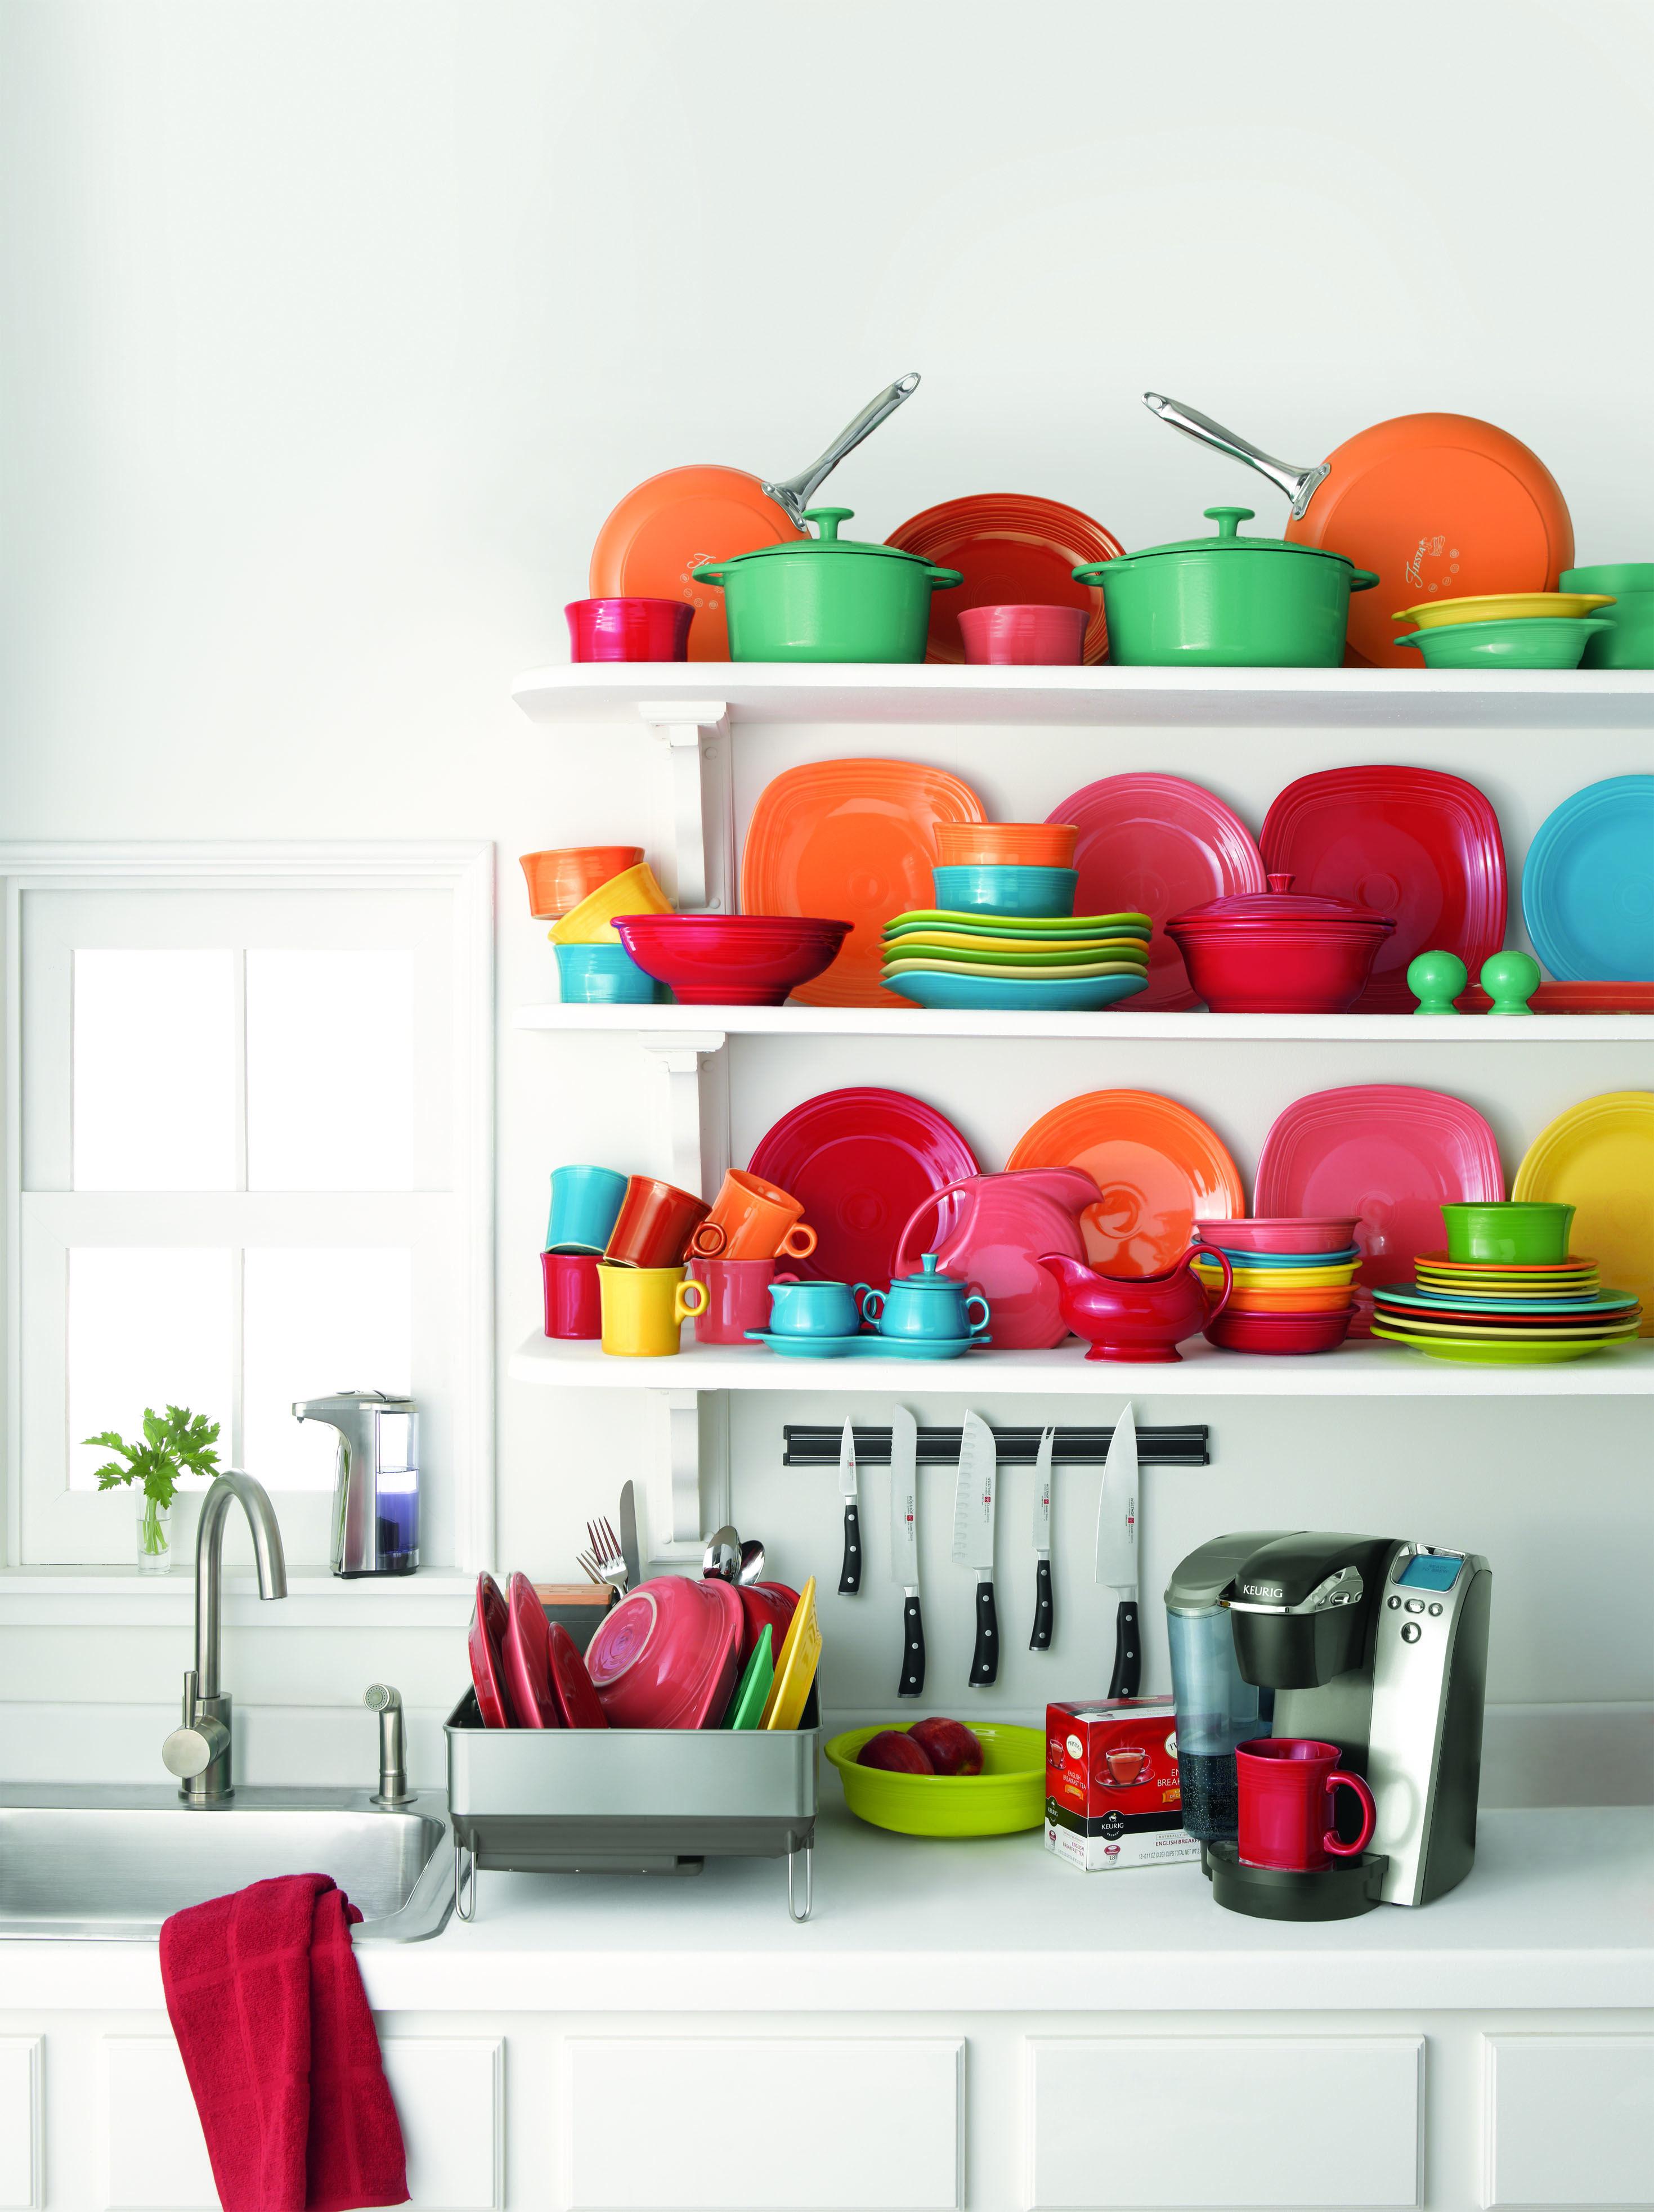 Bright Fiesta Dinnerware Would Look Great In The Open Cabinet.